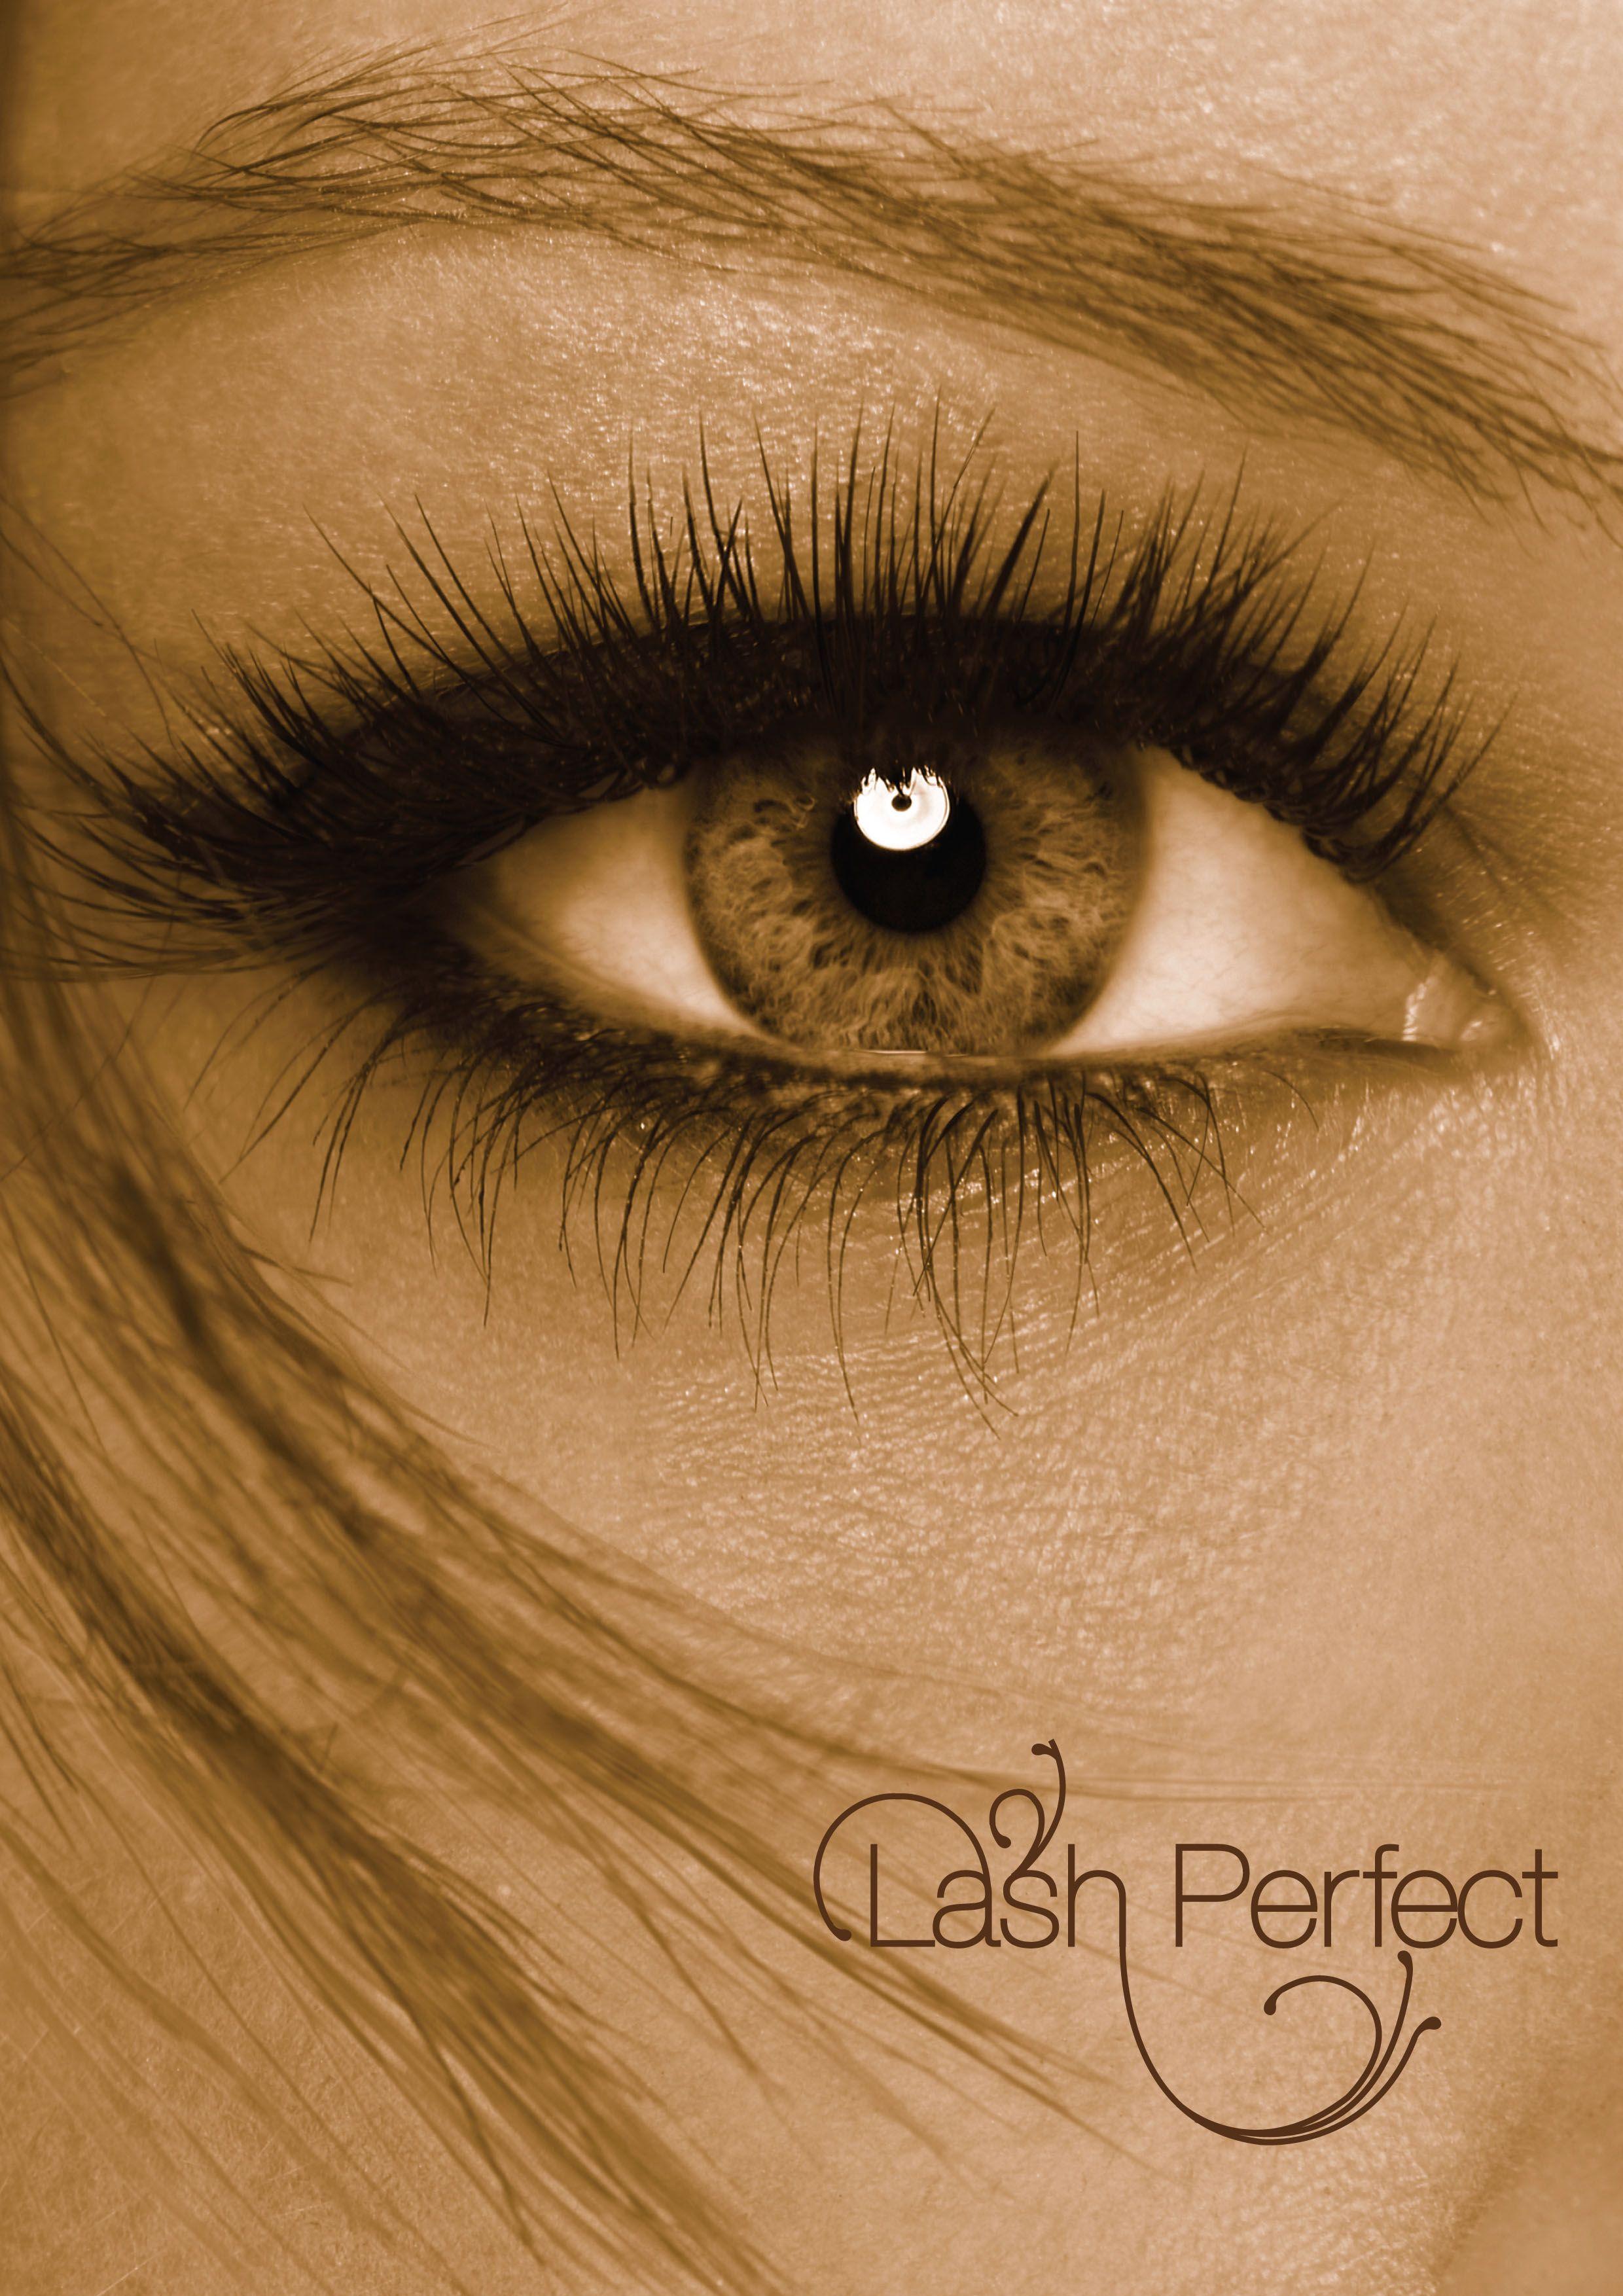 Lash Perfect Semi Permanent Eyelashes 55 Therapy Skincare Halifax